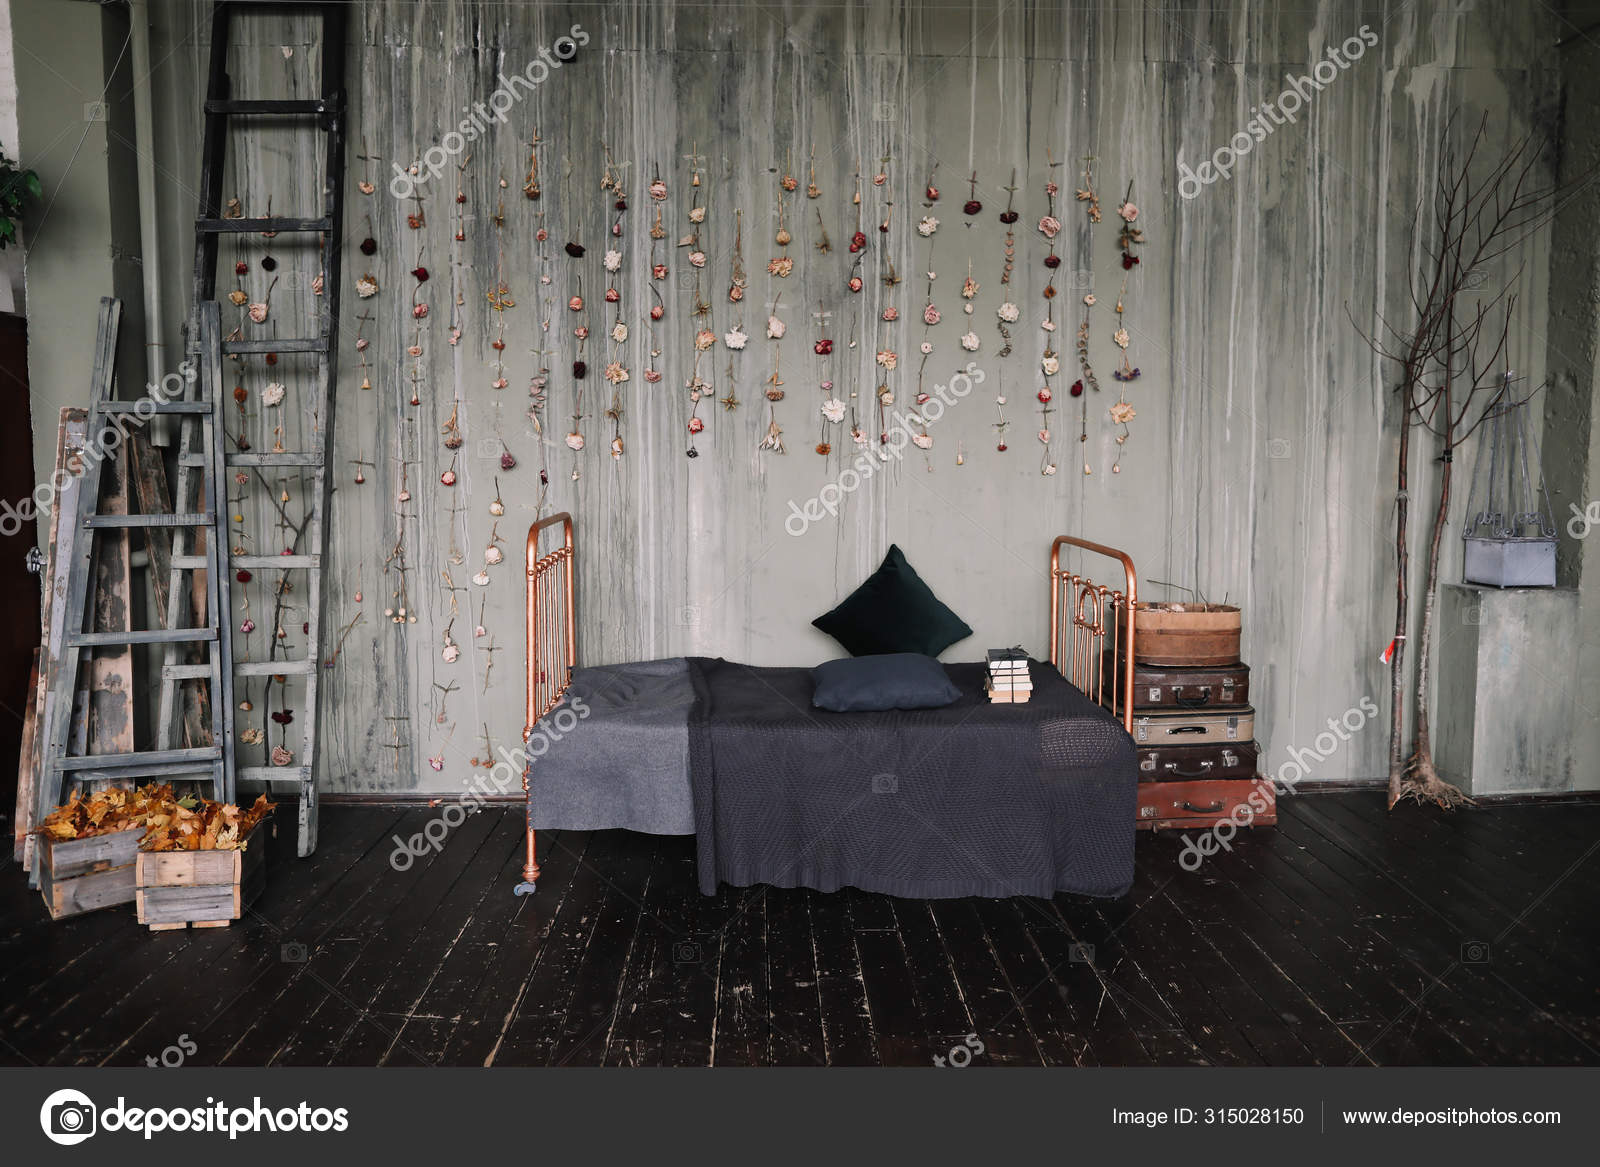 Vintage Bedroom Interior Loft Style Bedroom Vintage Studio Apartment Interior In Dark Colors In Old Style Stock Photo C Gkondratenko 315028150